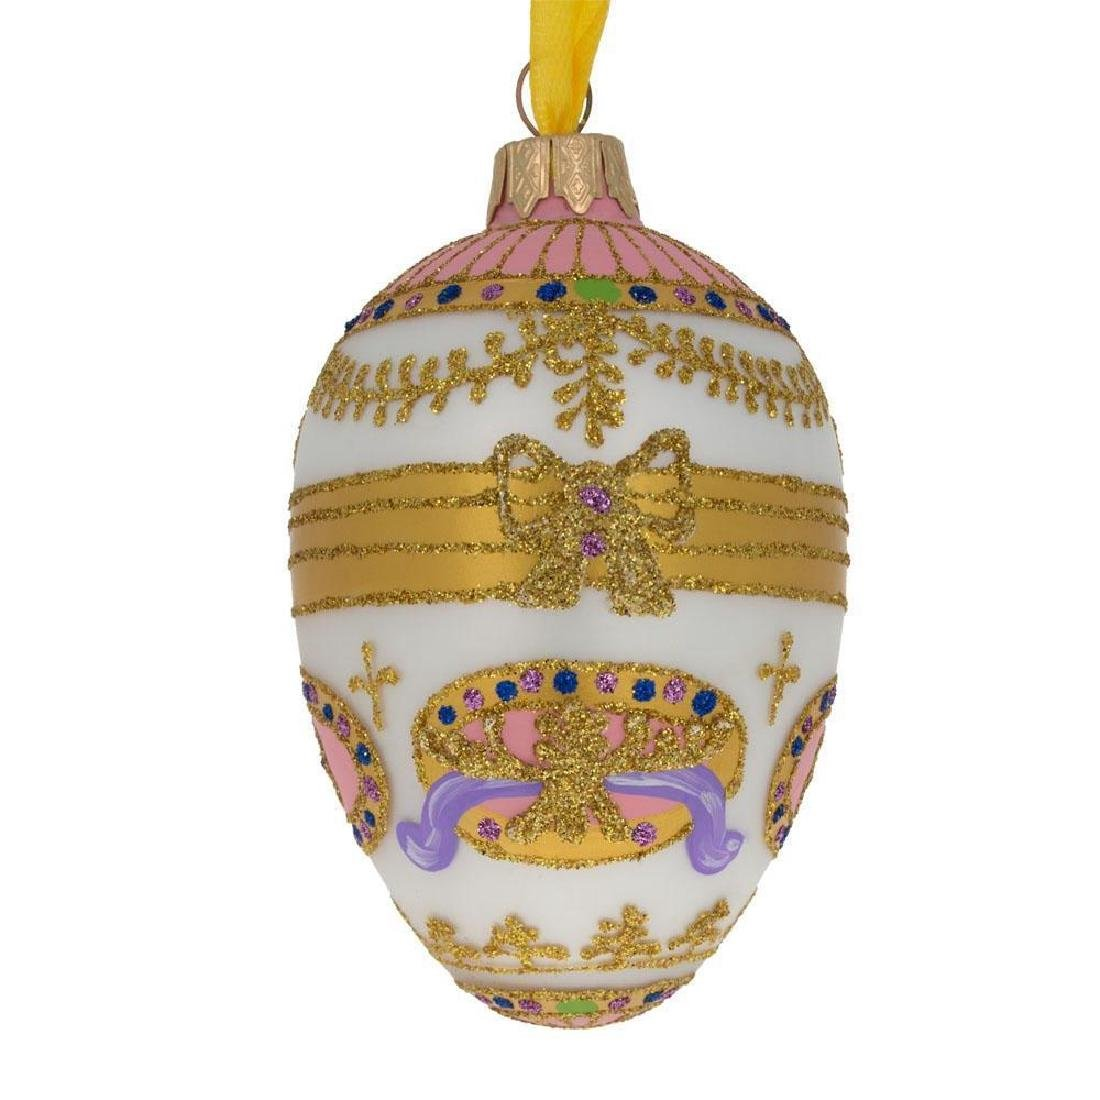 "4"" Bonbonniere Royal Egg Glass Christmas Ornament"